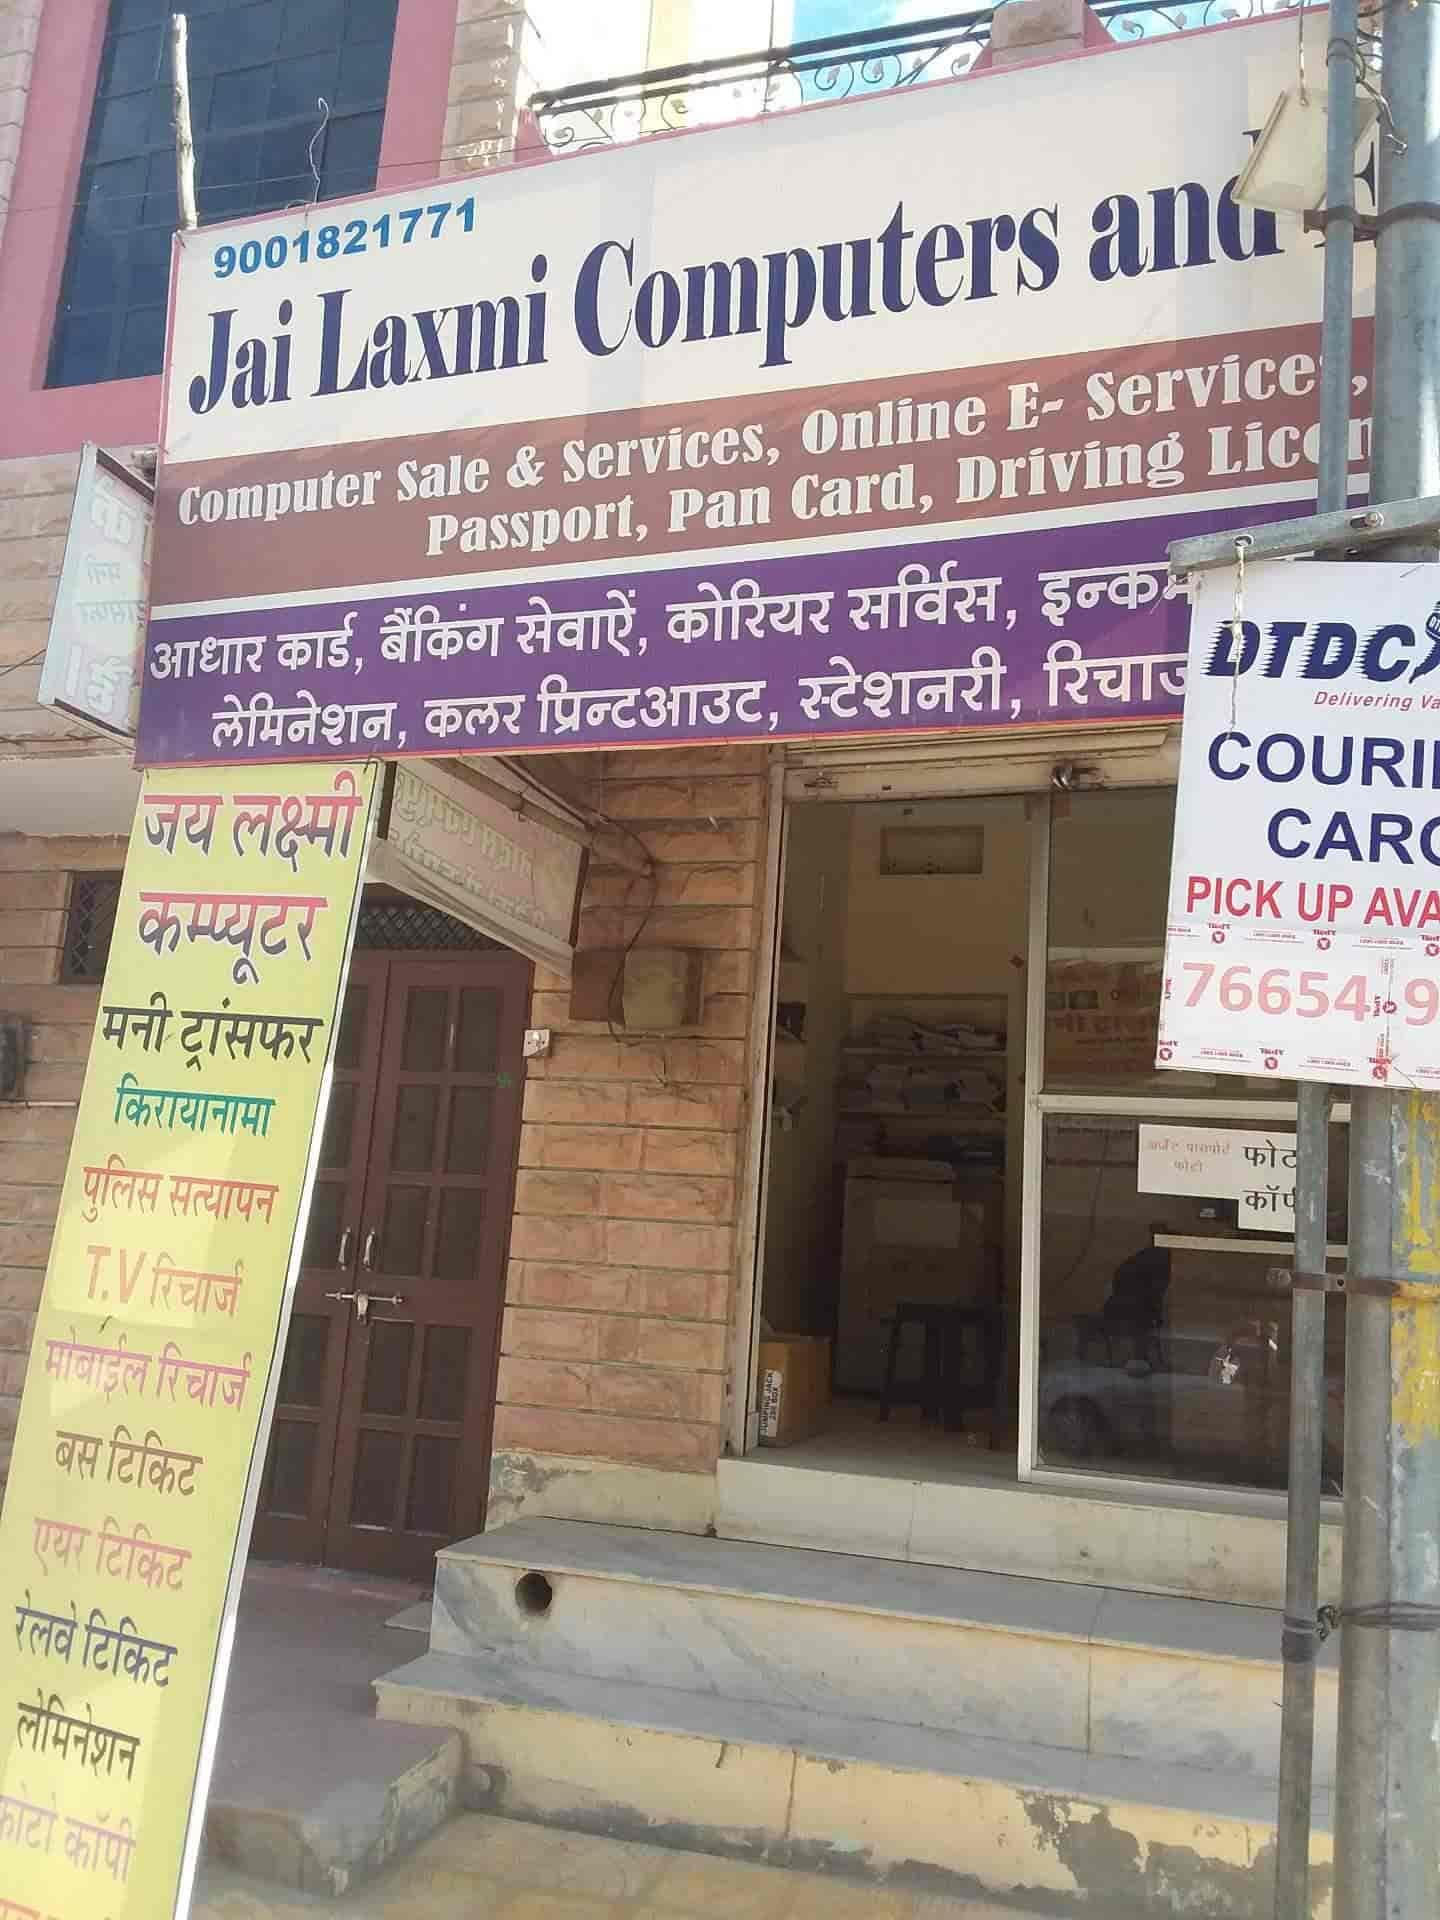 Jai Laxmi Computers E-services Photos, Kudi, Jodhpur- Pictures